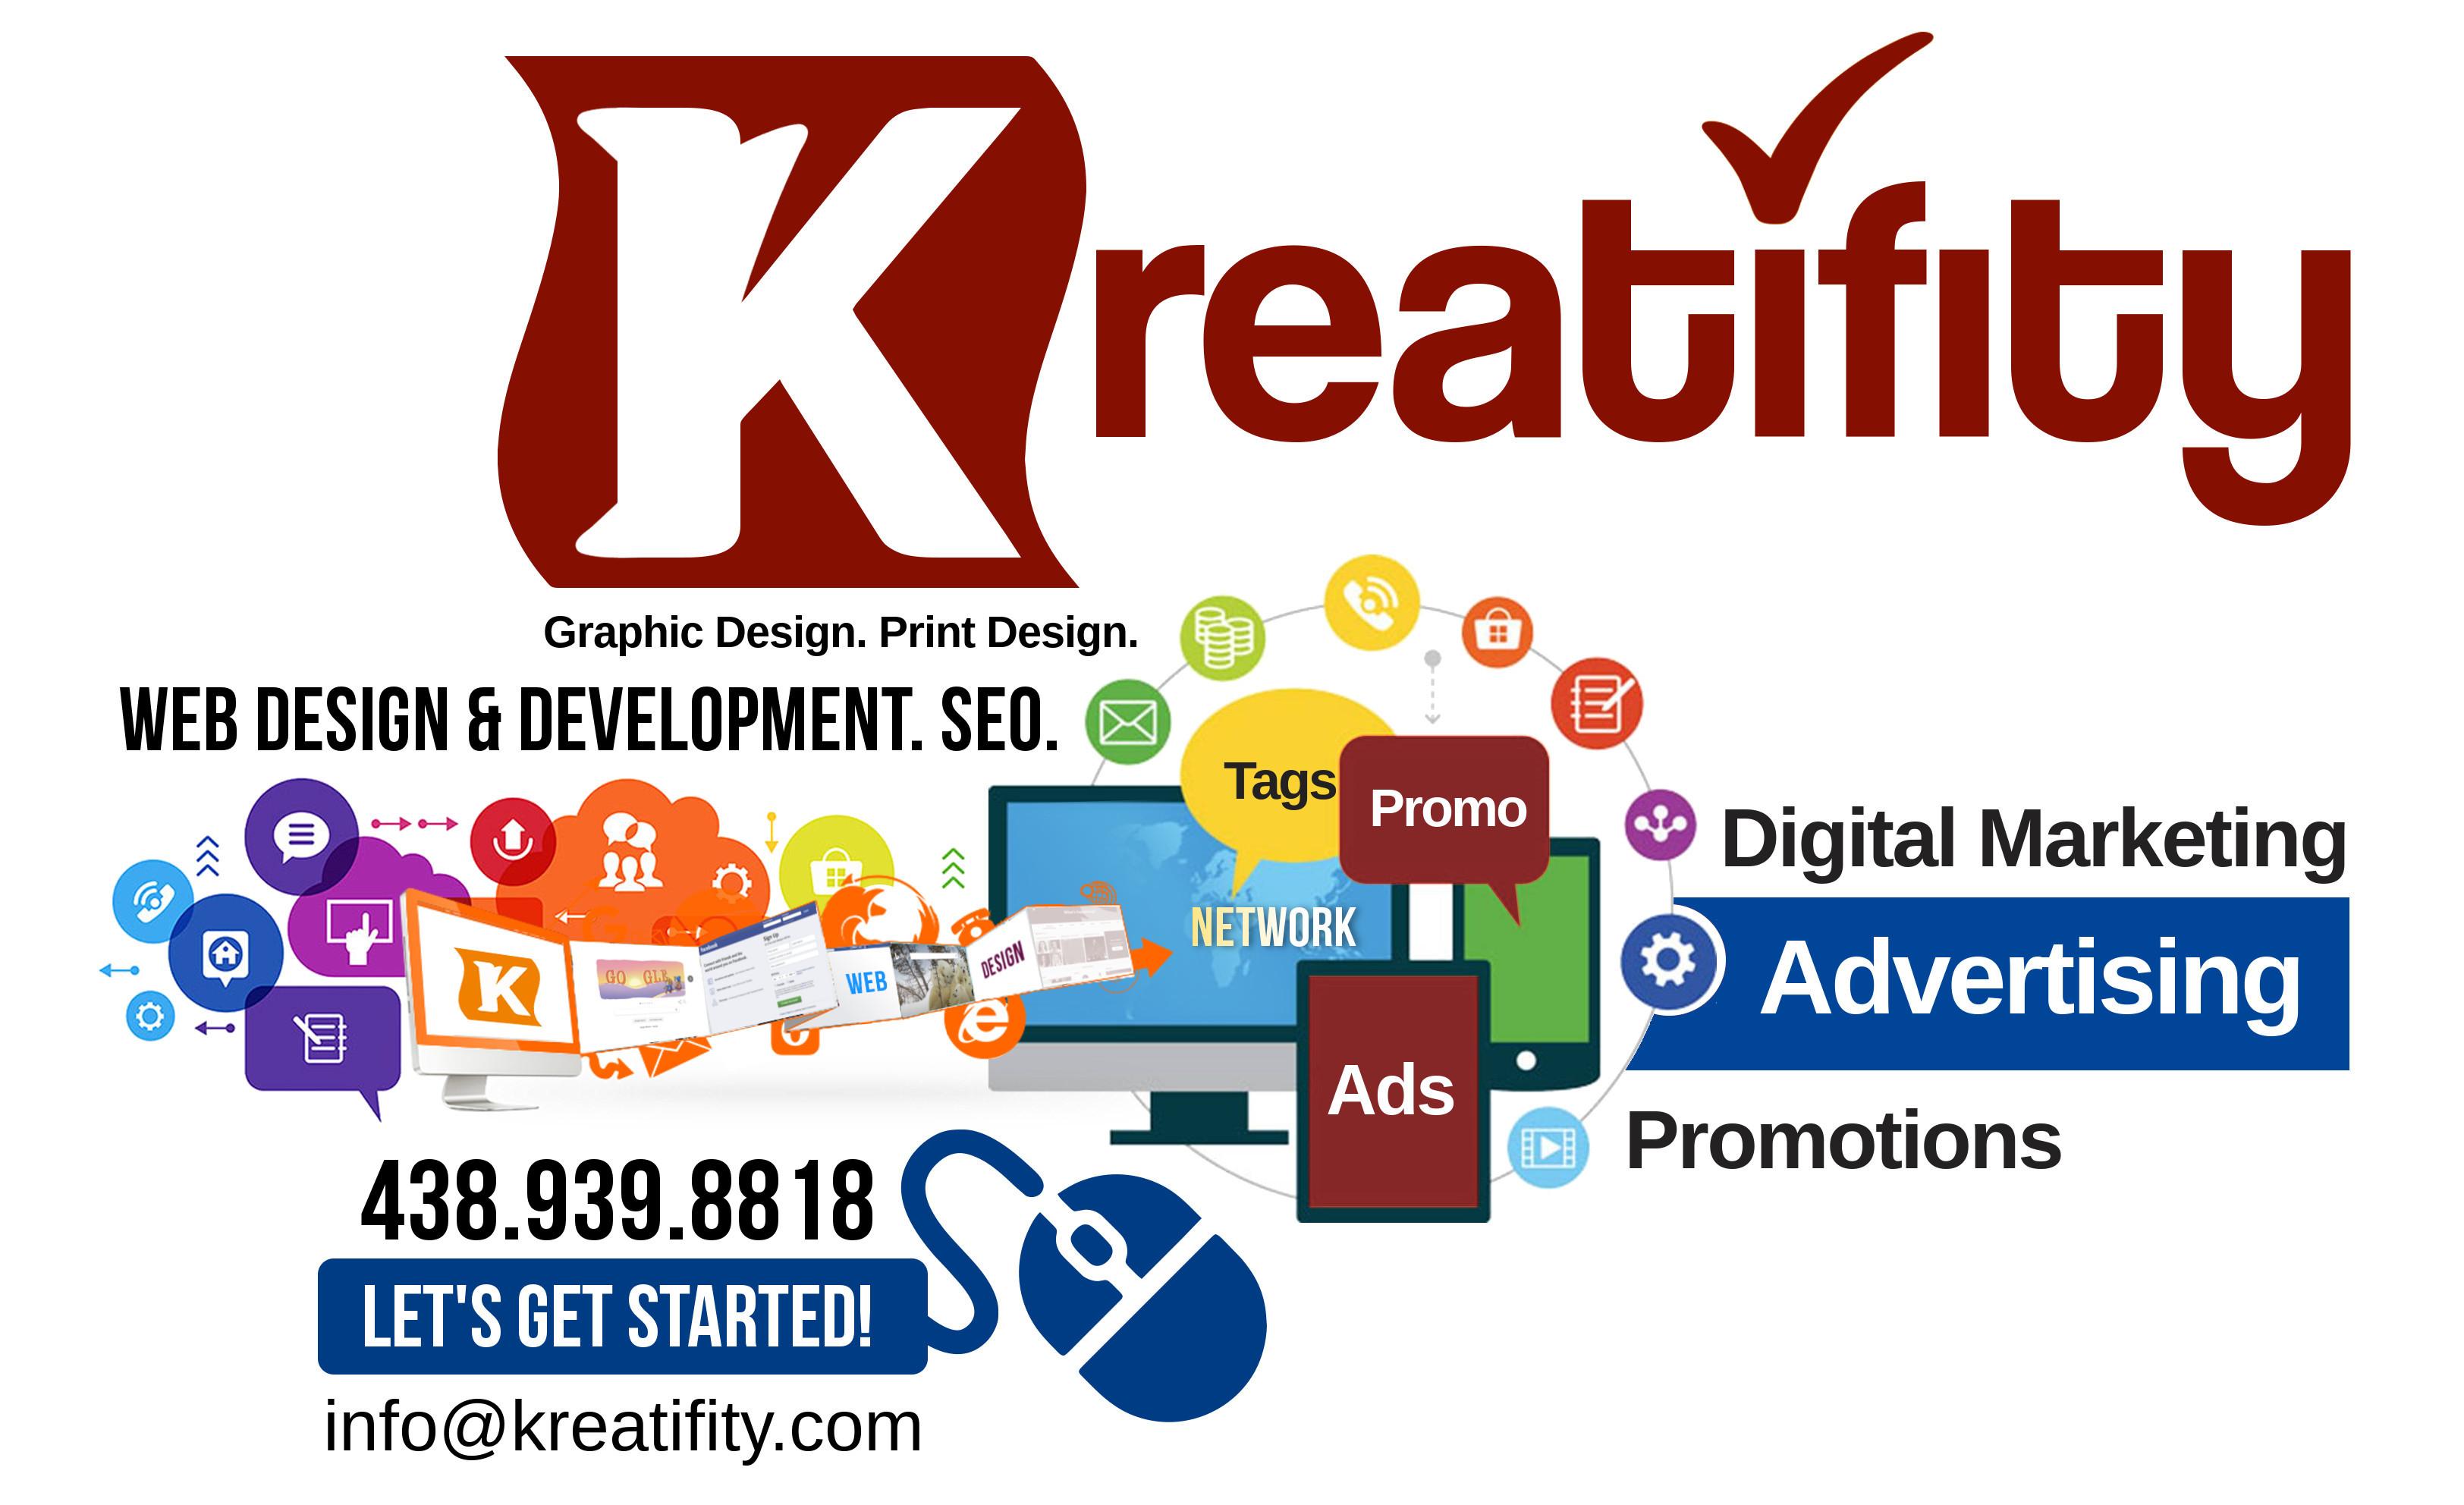 KREATIFITY MARKETING SERVICES – Web Site & Print Design